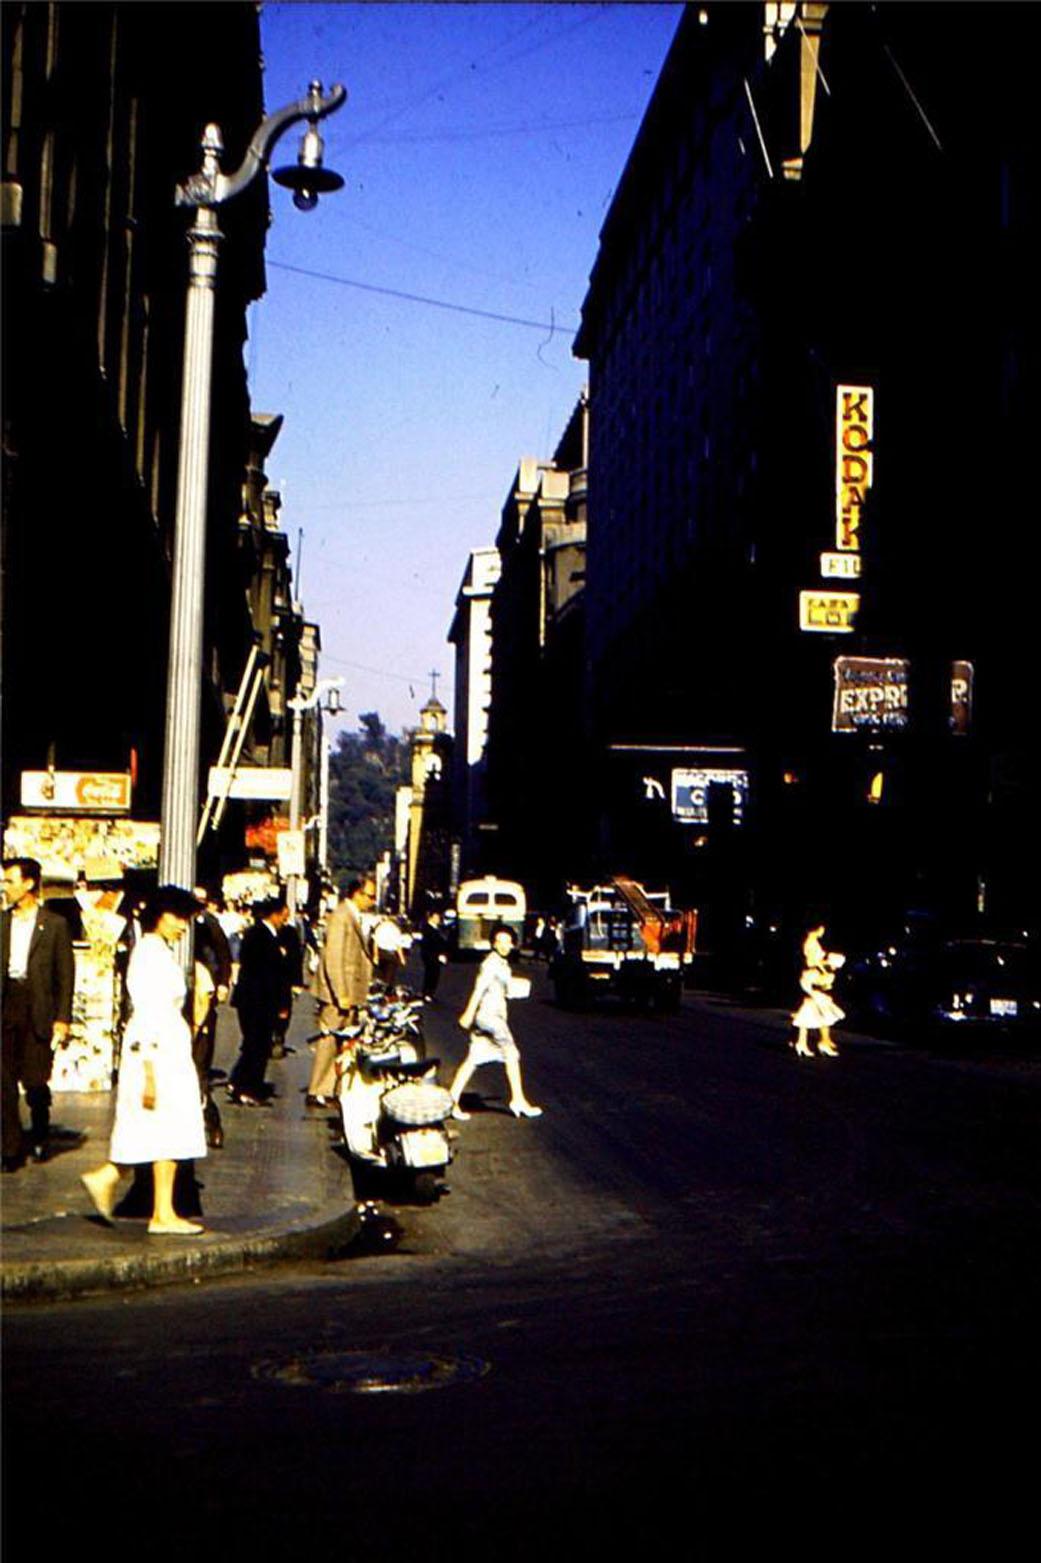 Enterreno - Fotos históricas de chile - fotos antiguas de Chile - Calle Merced de Santiago en 1960